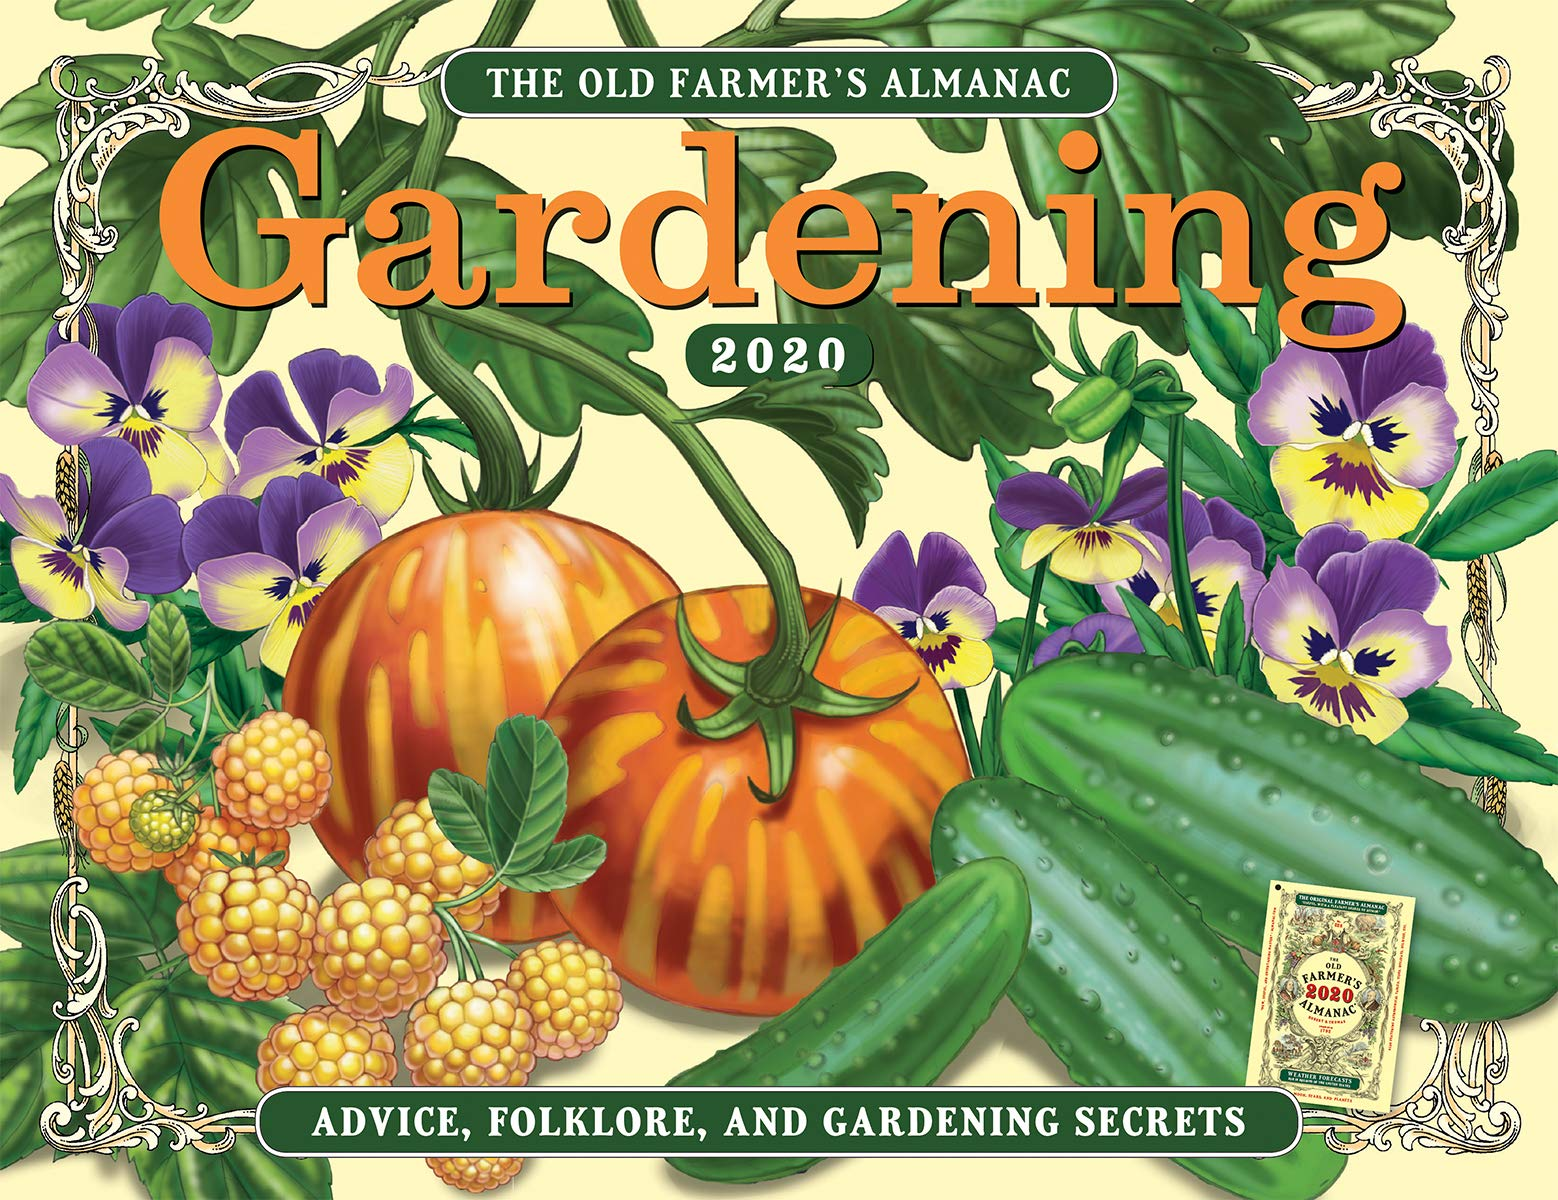 Image for The 2020 Old Farmer's Almanac Gardening Calendar